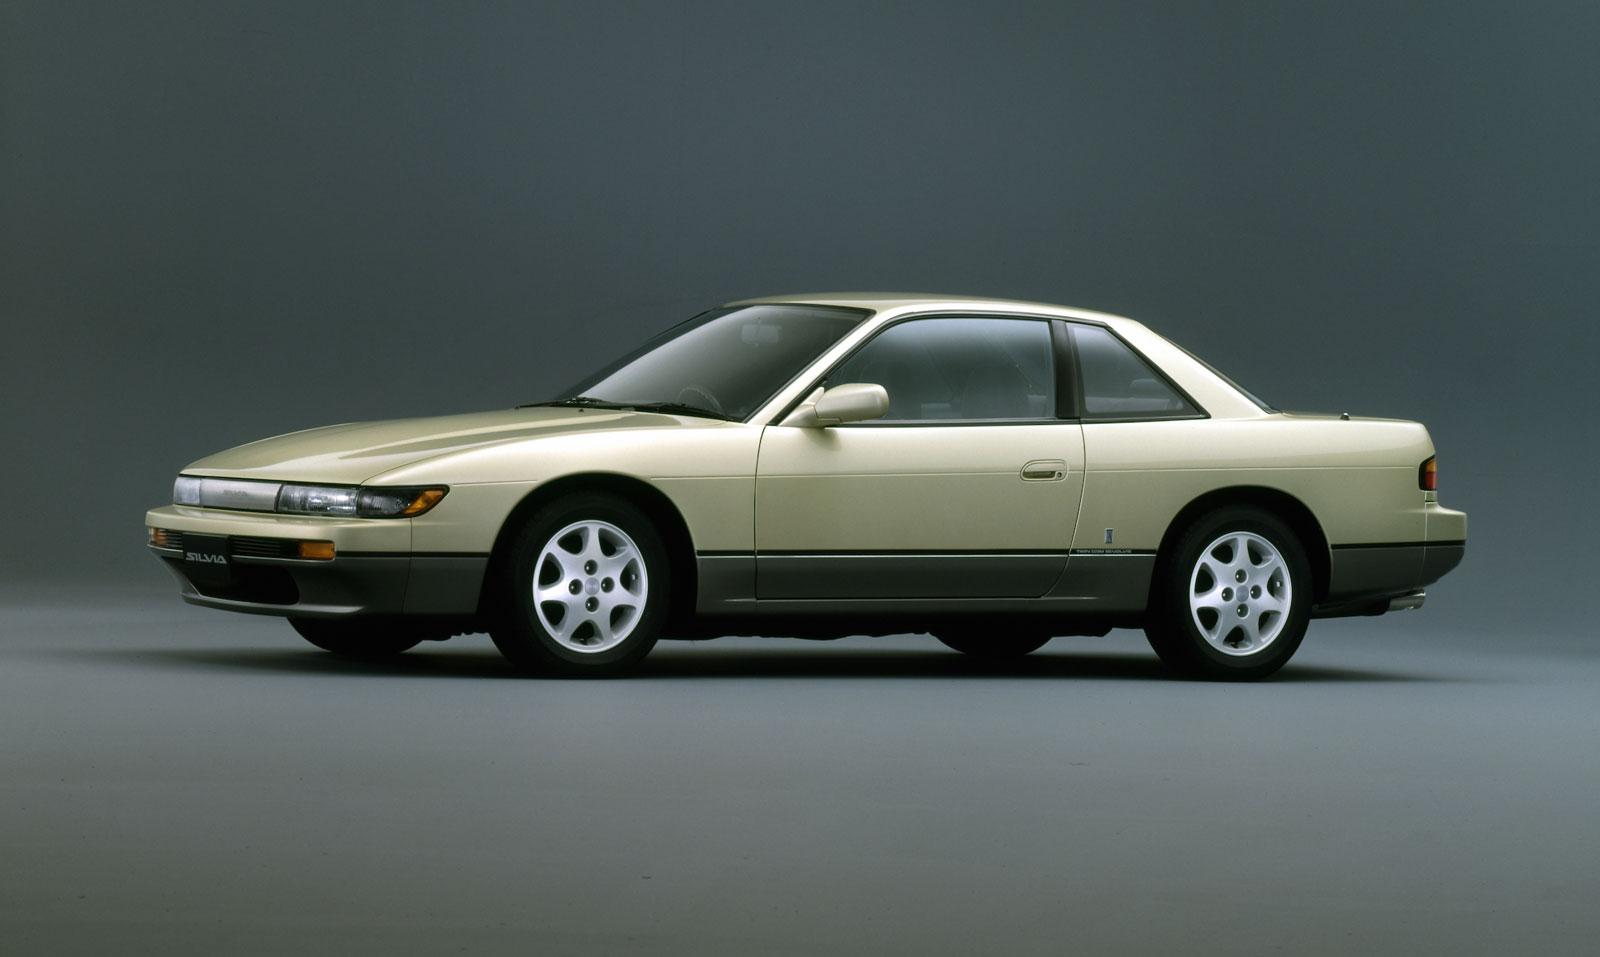 Nissan Silvia S13 Car Body Design